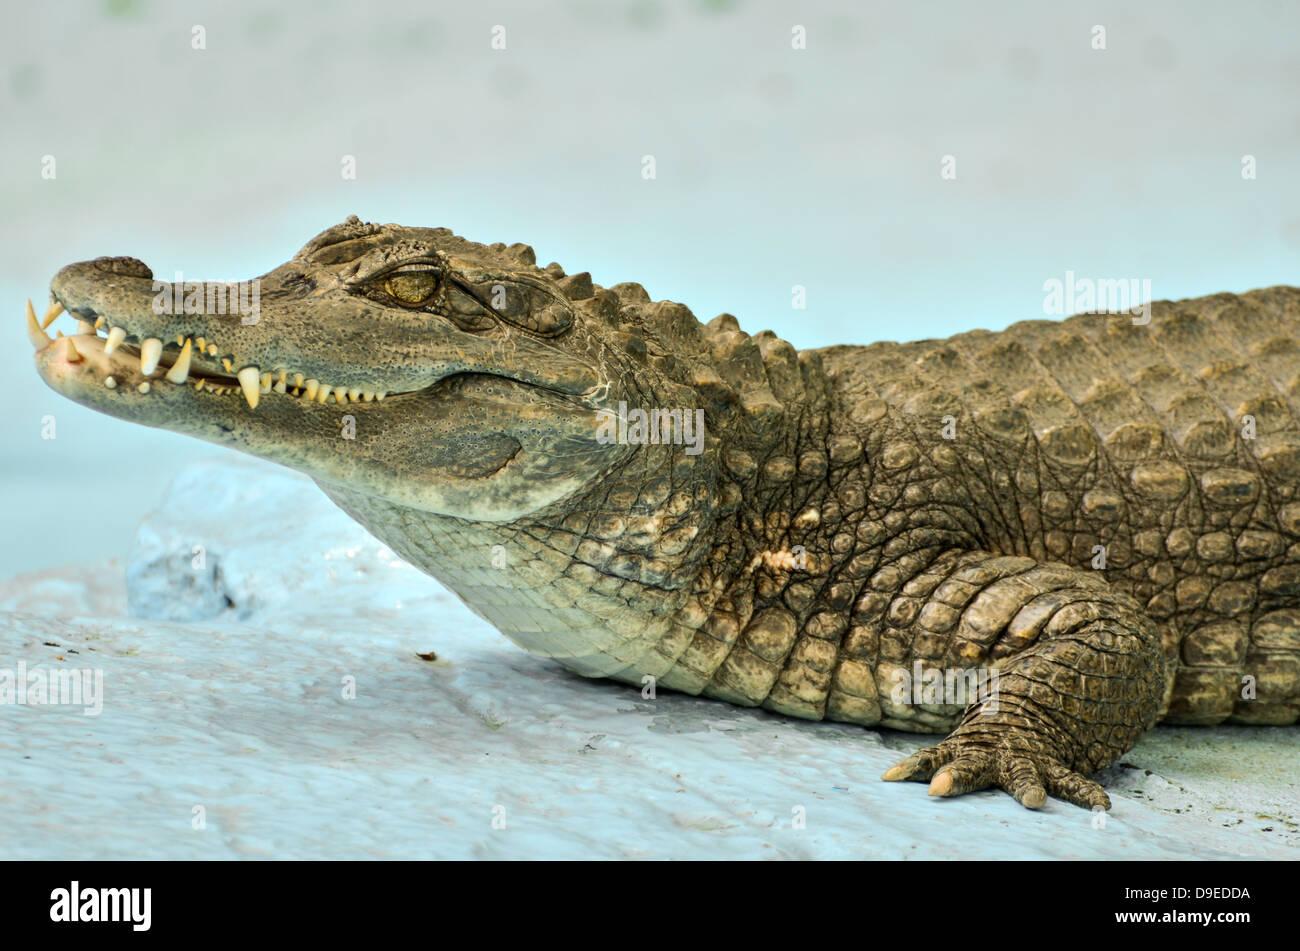 e7b125855990 Small Cayman crocodile Stock Photo  57480902 - Alamy